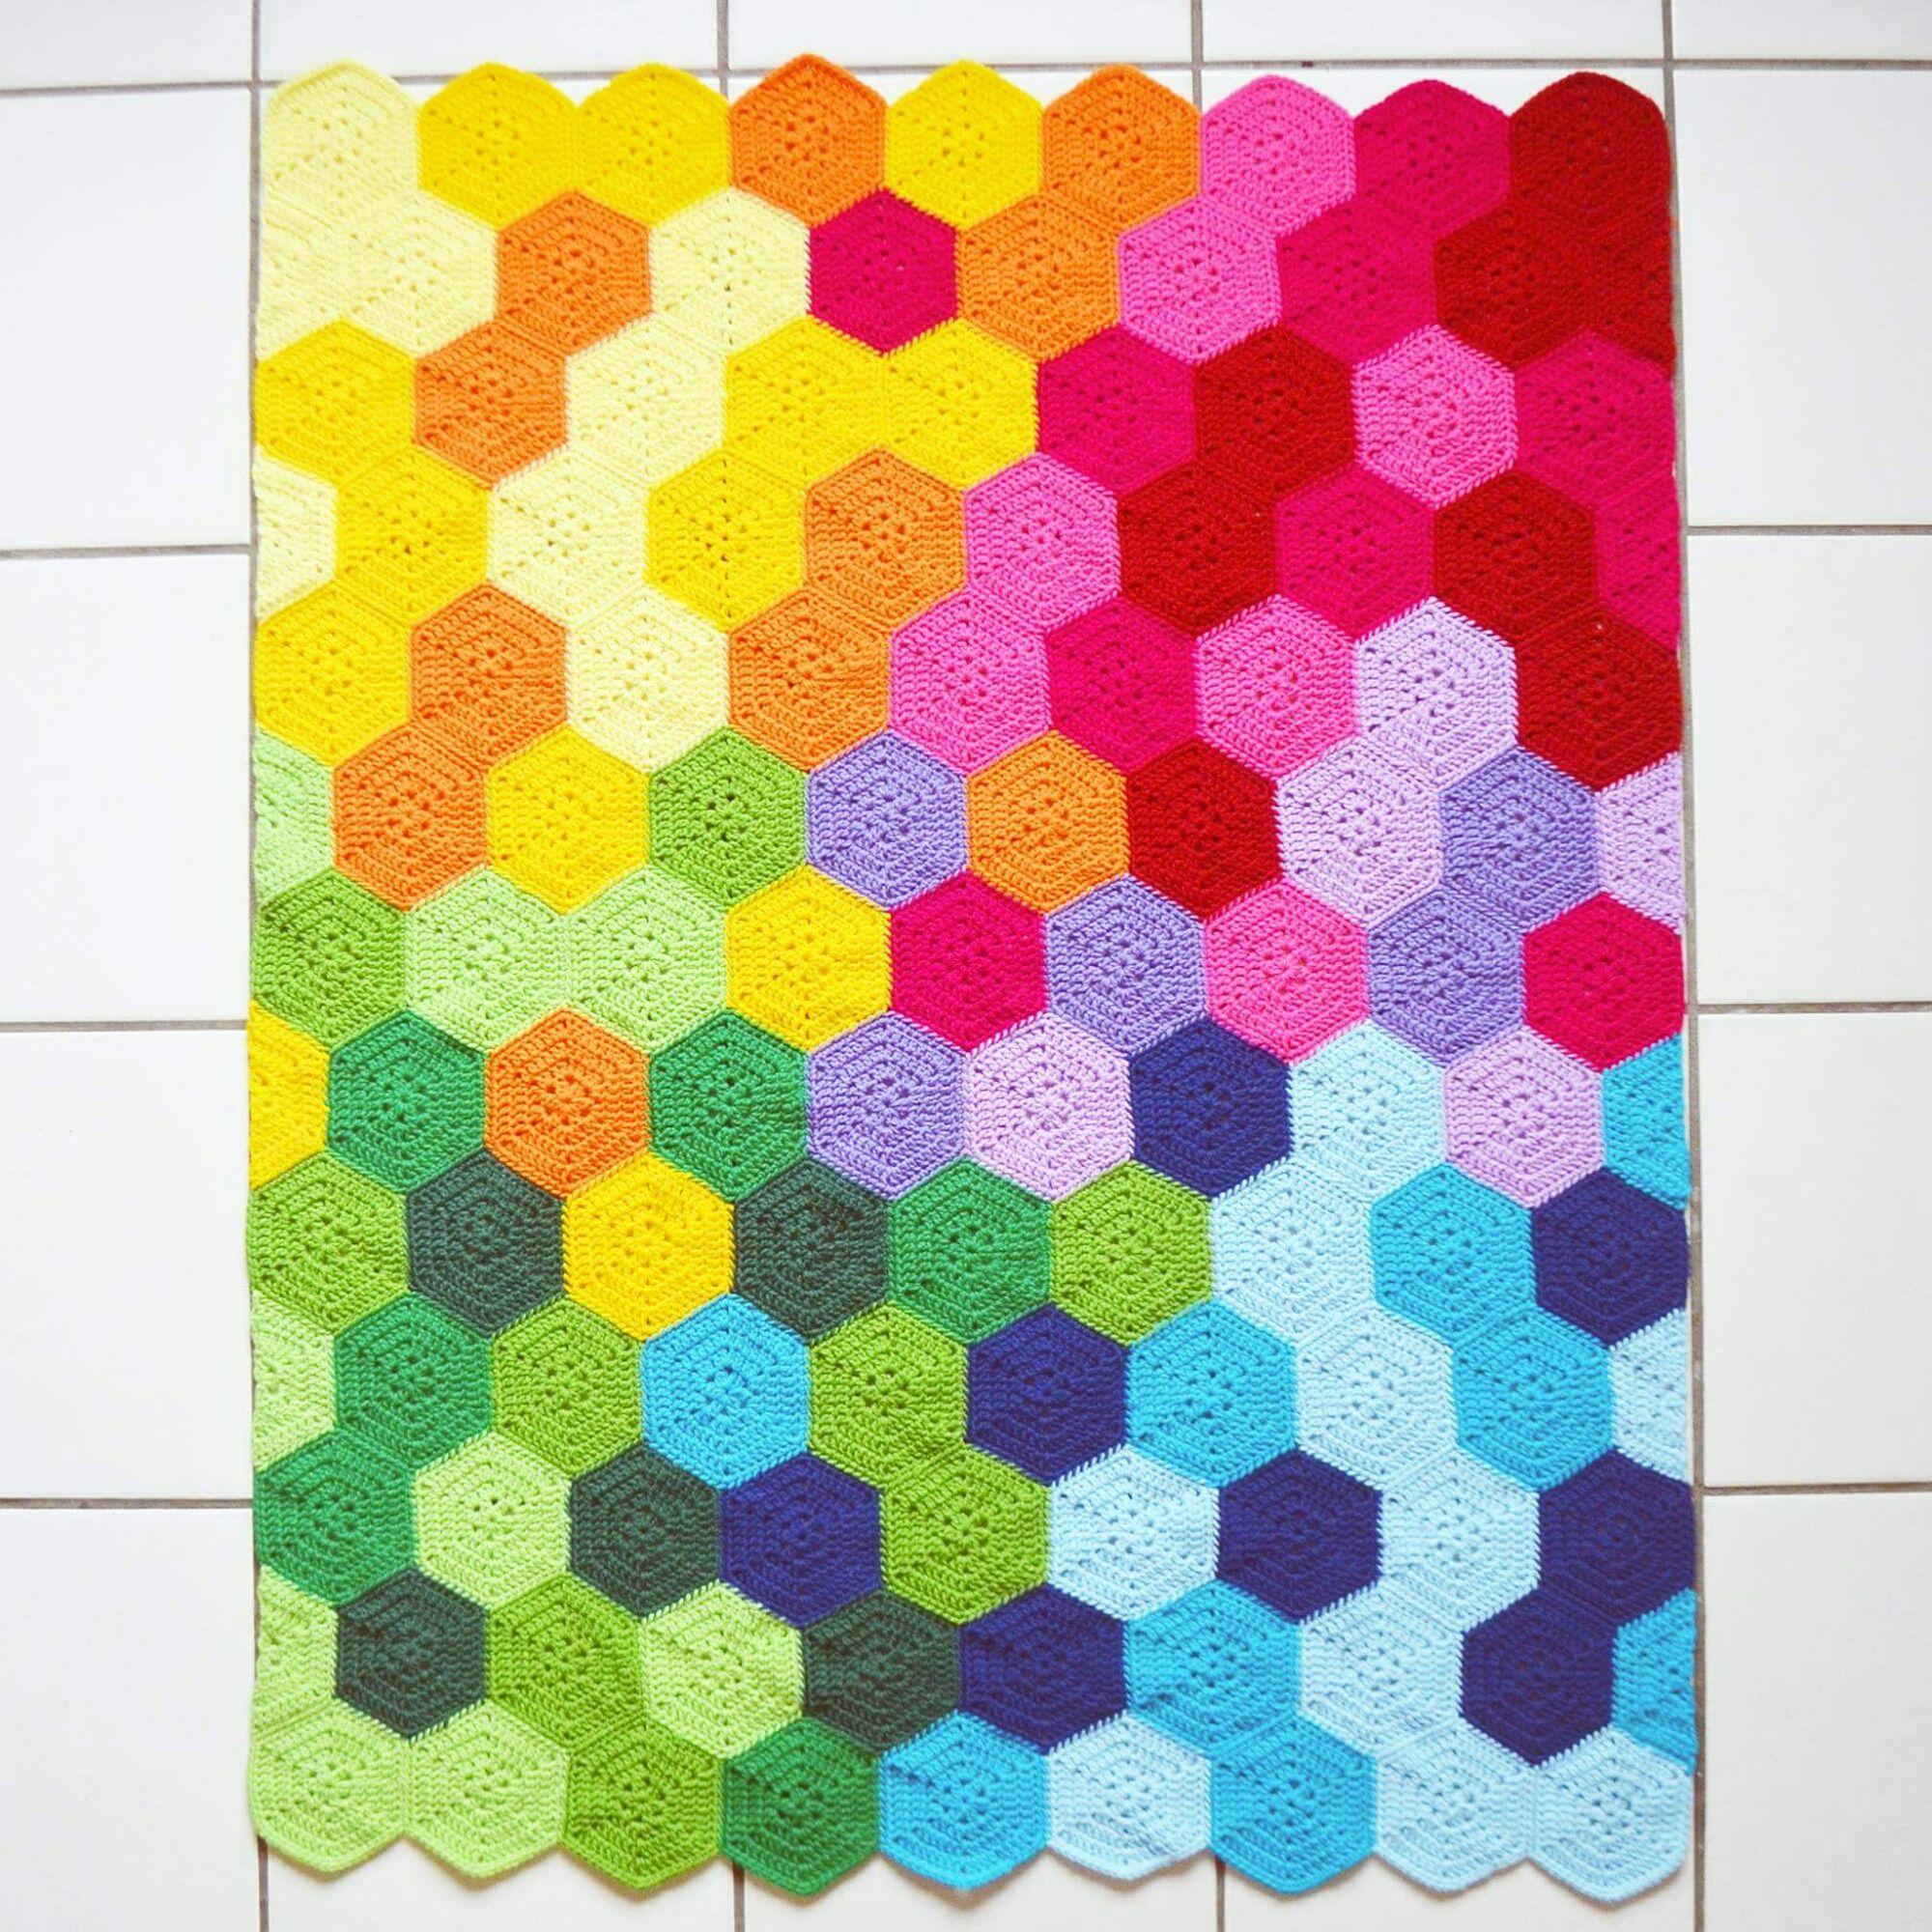 The Rainbow Hexie Blanket - Information on where she got the hexagon ...